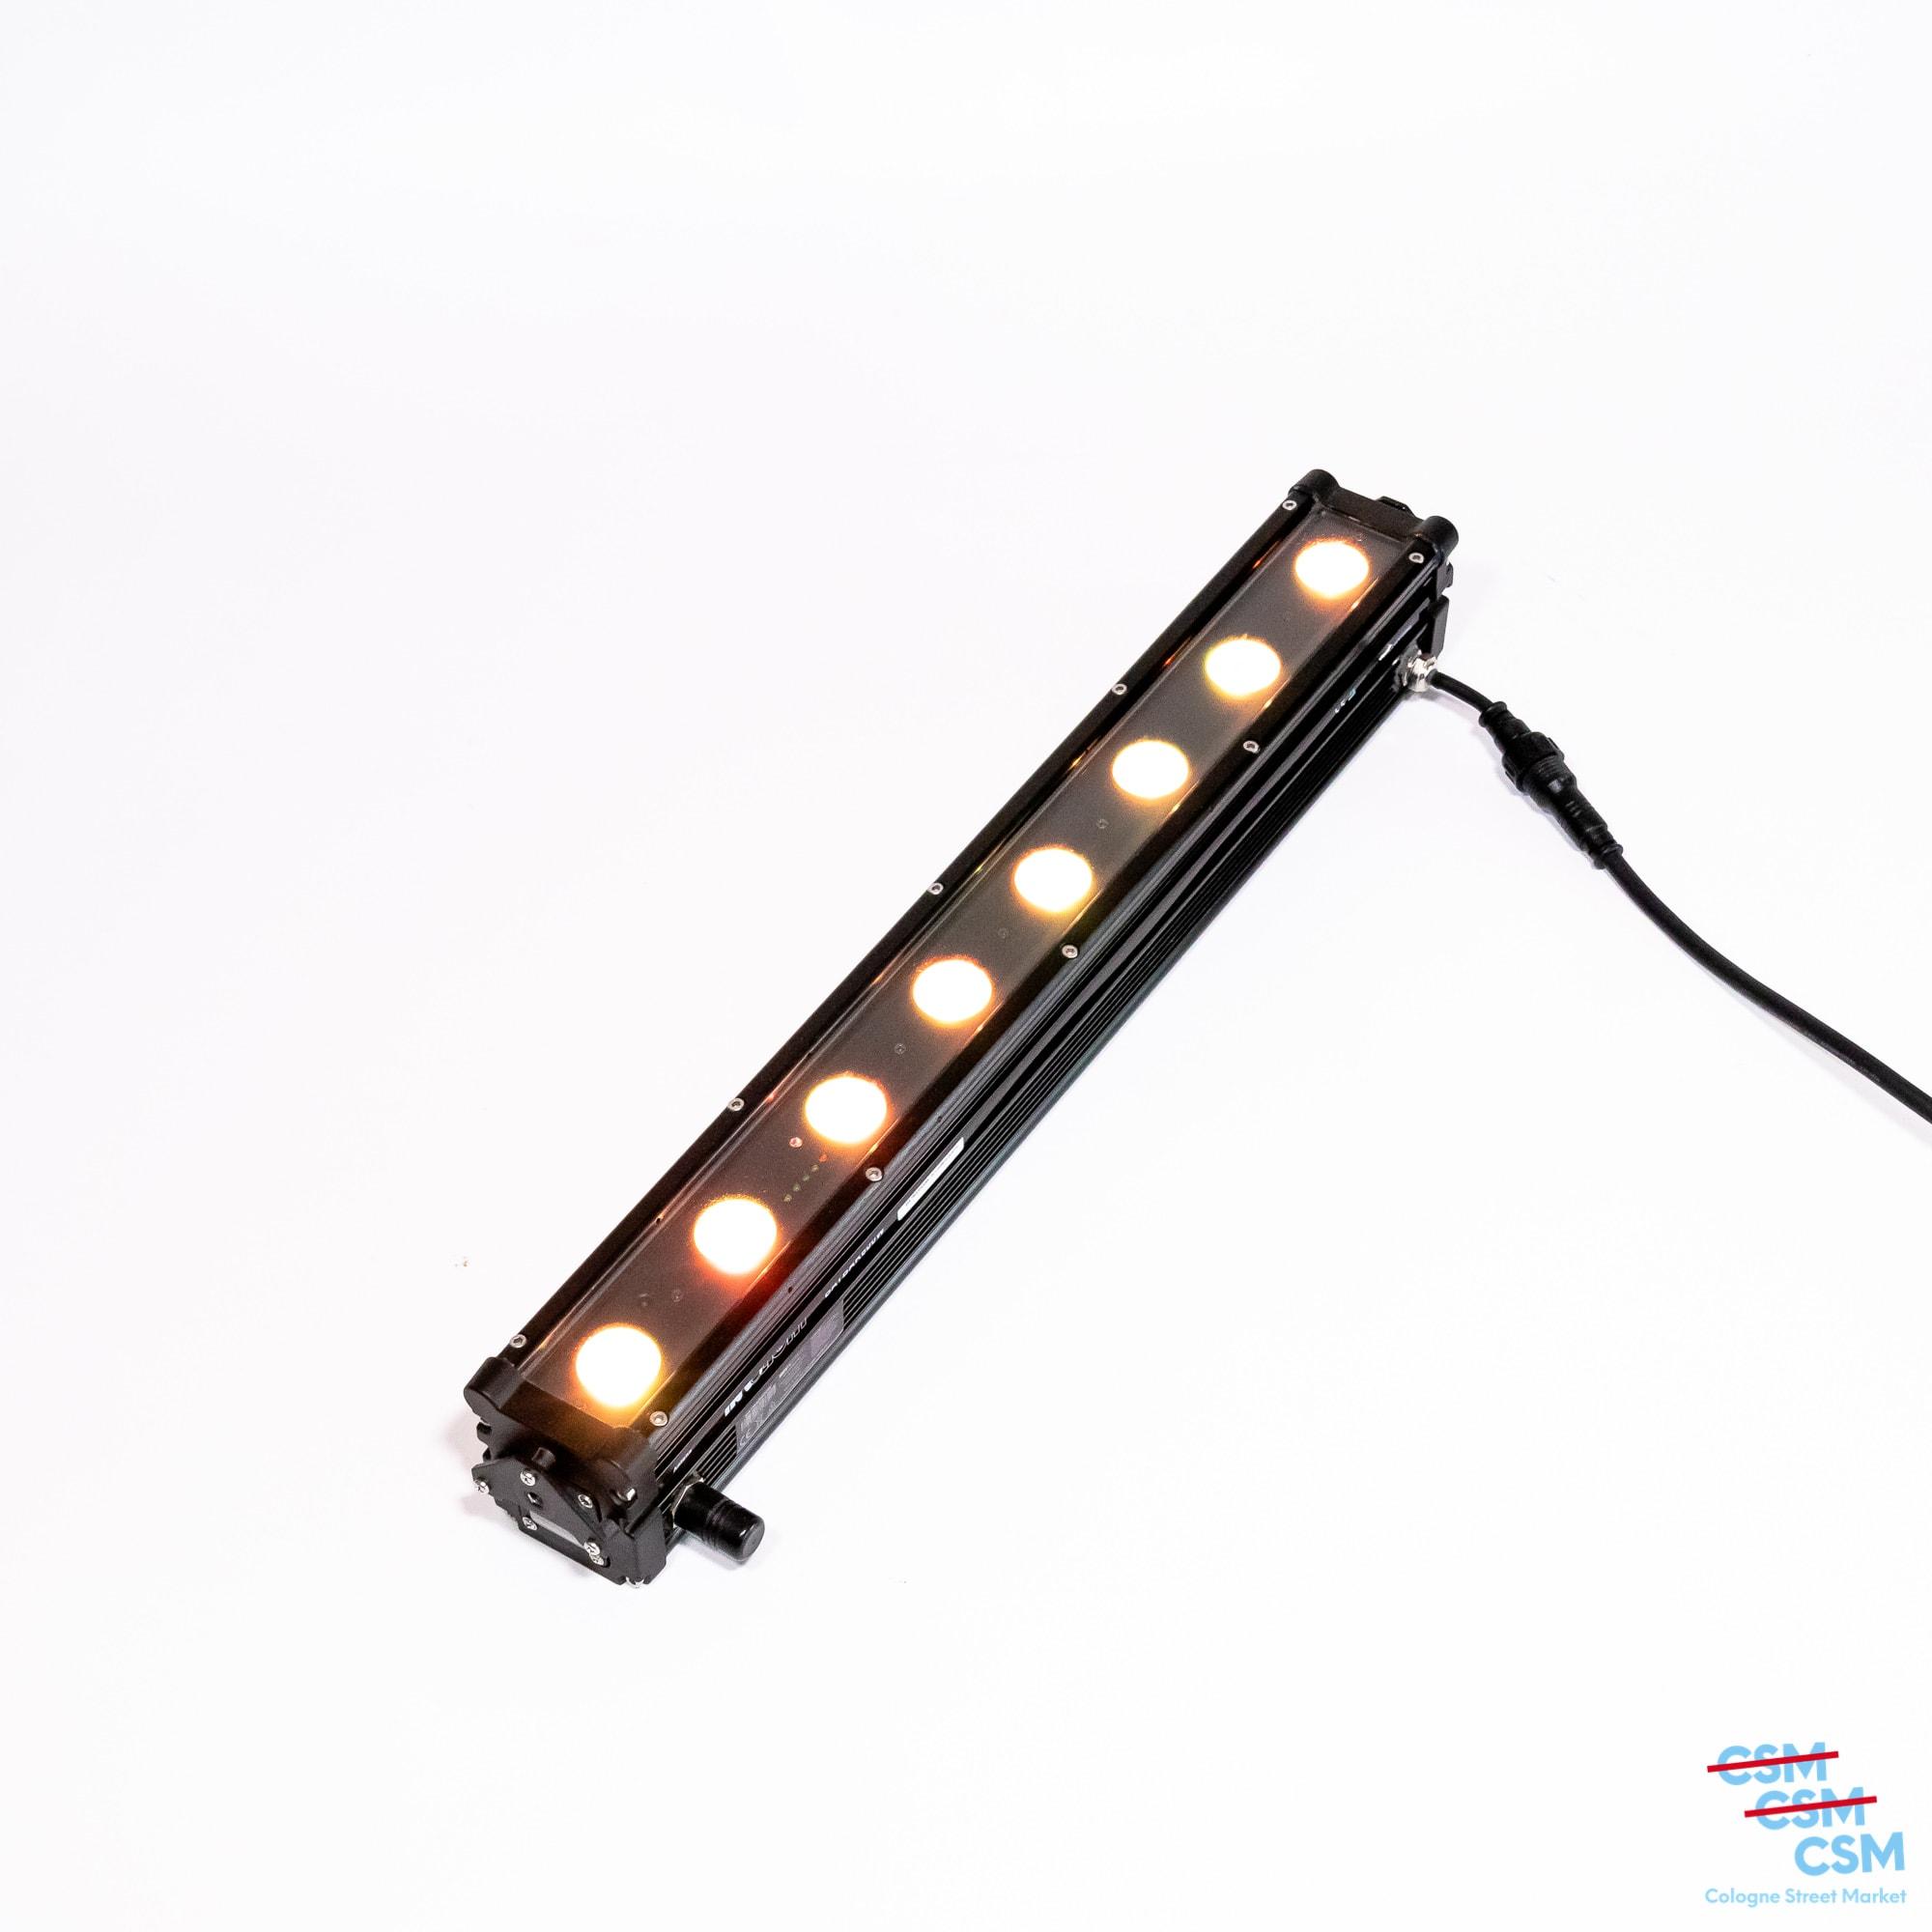 Involight-Bat-Bar-600-gebraucht-gebraucht